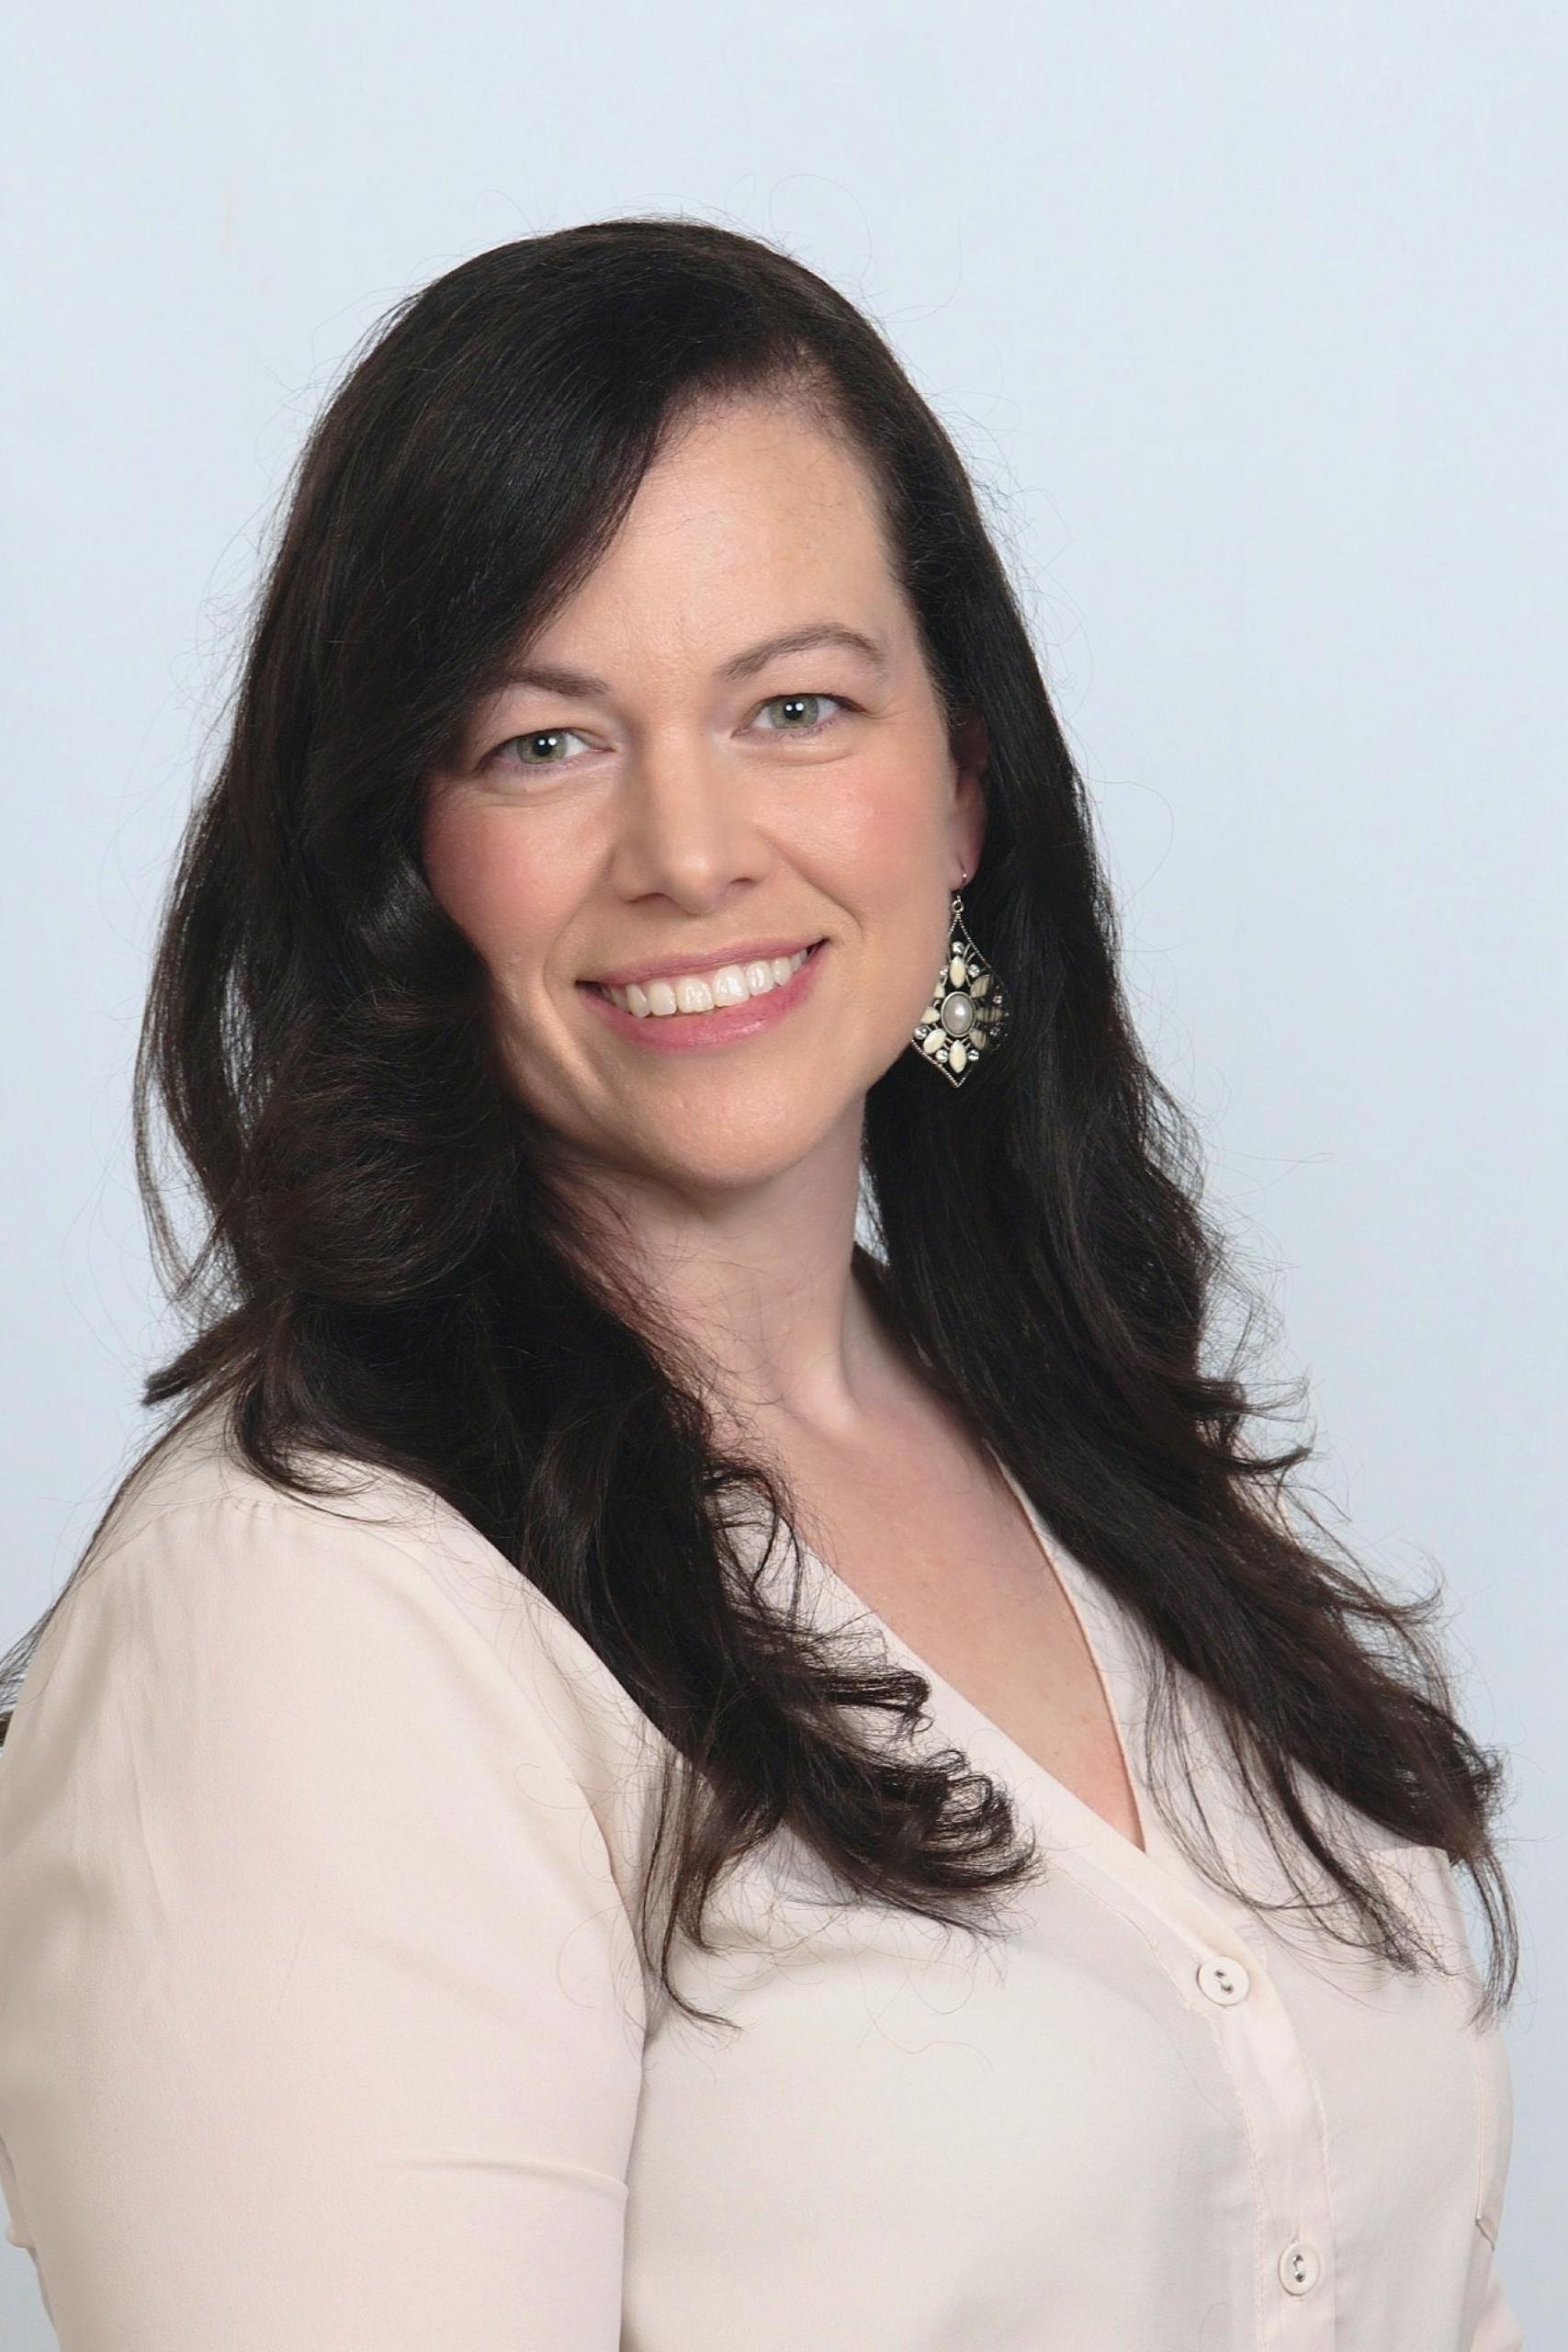 Image of Keri Meador